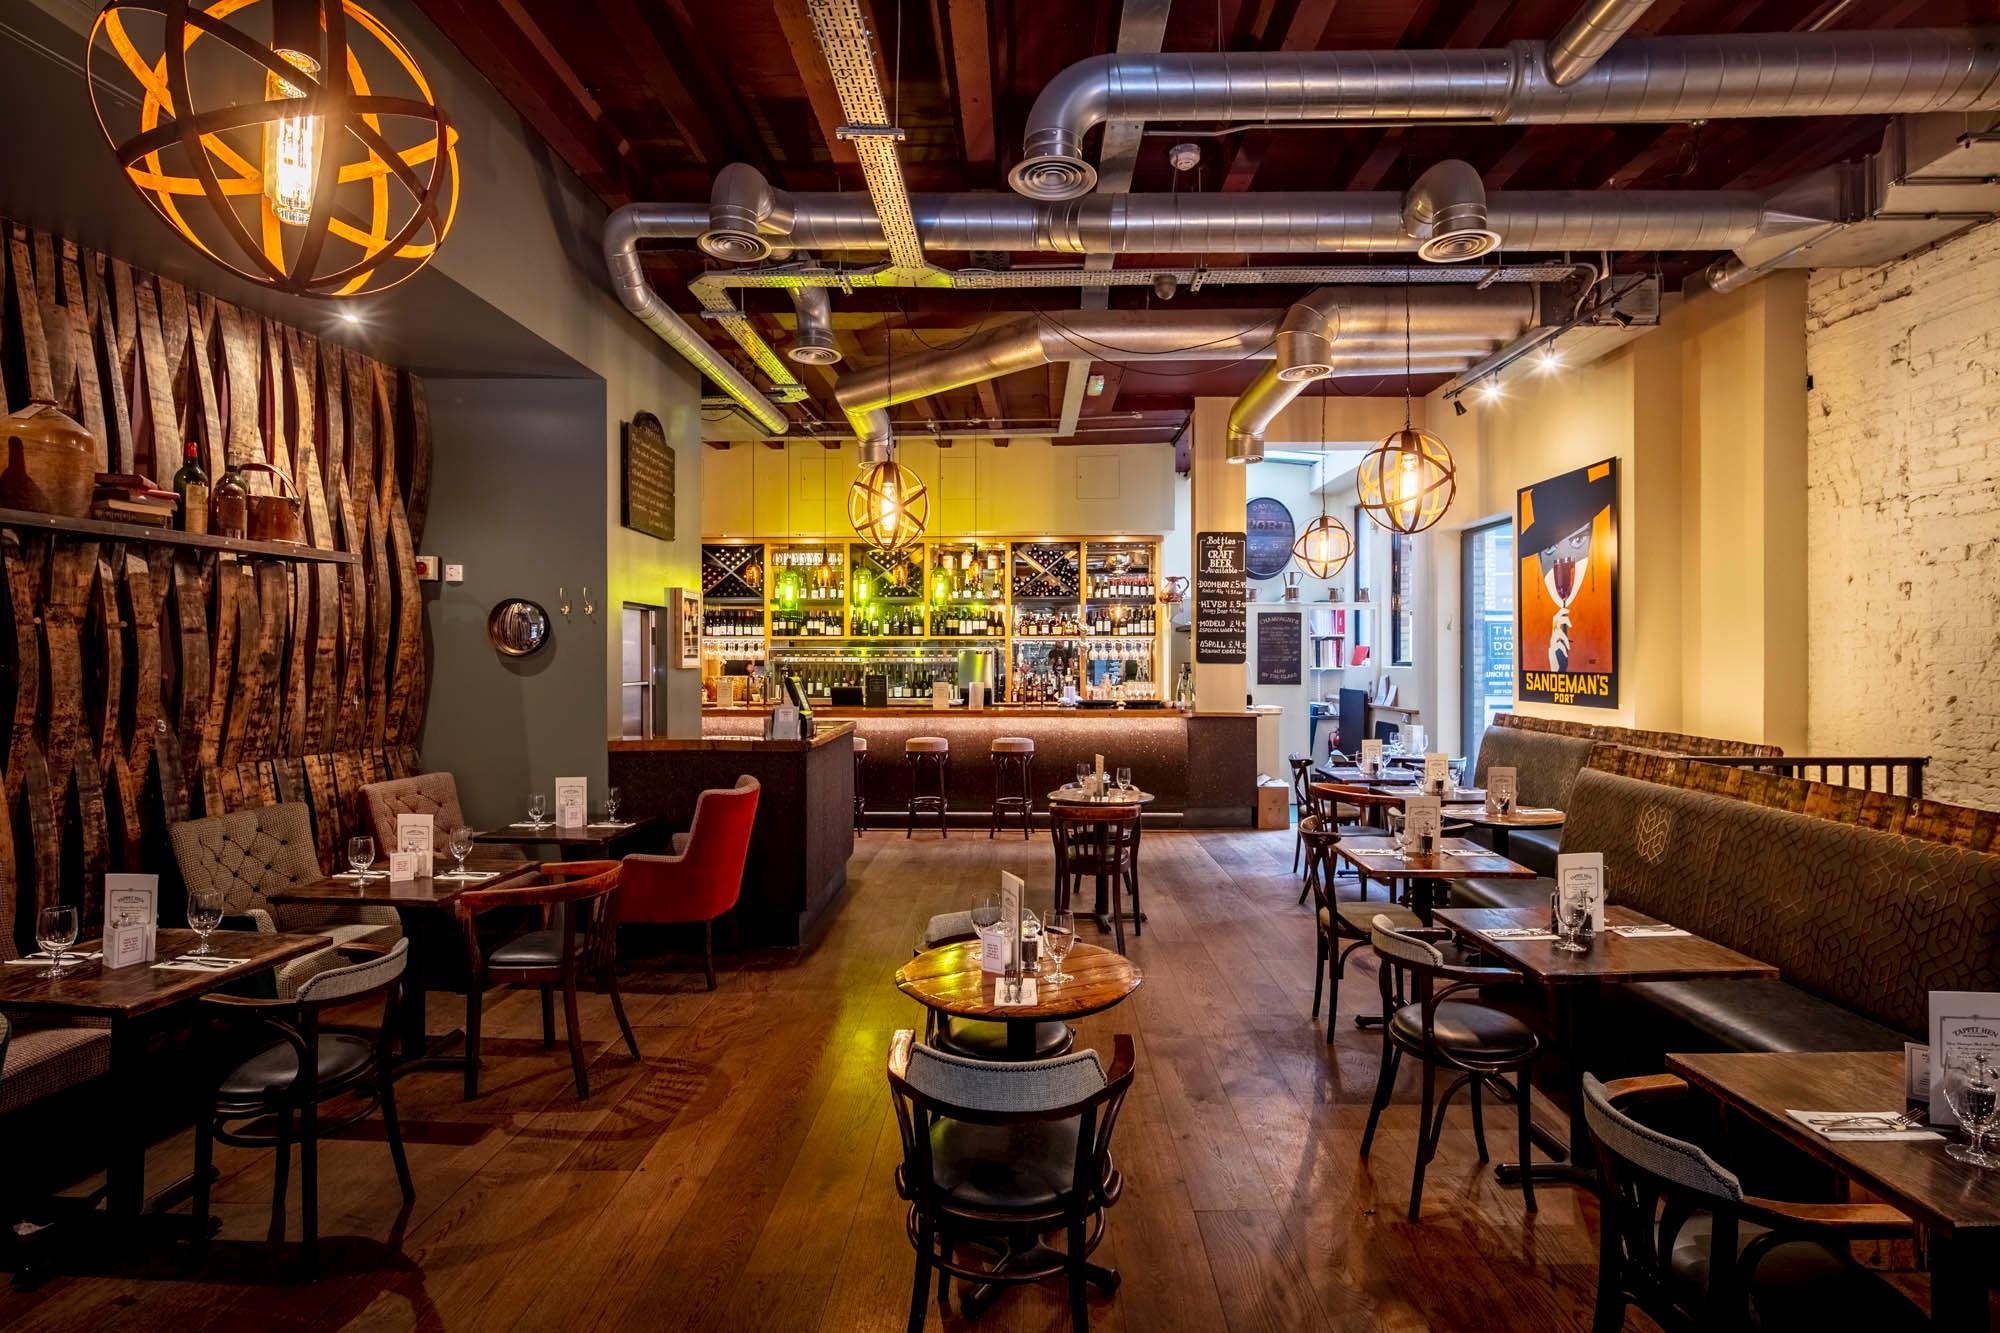 Davy's Wine Bars and Restaurants